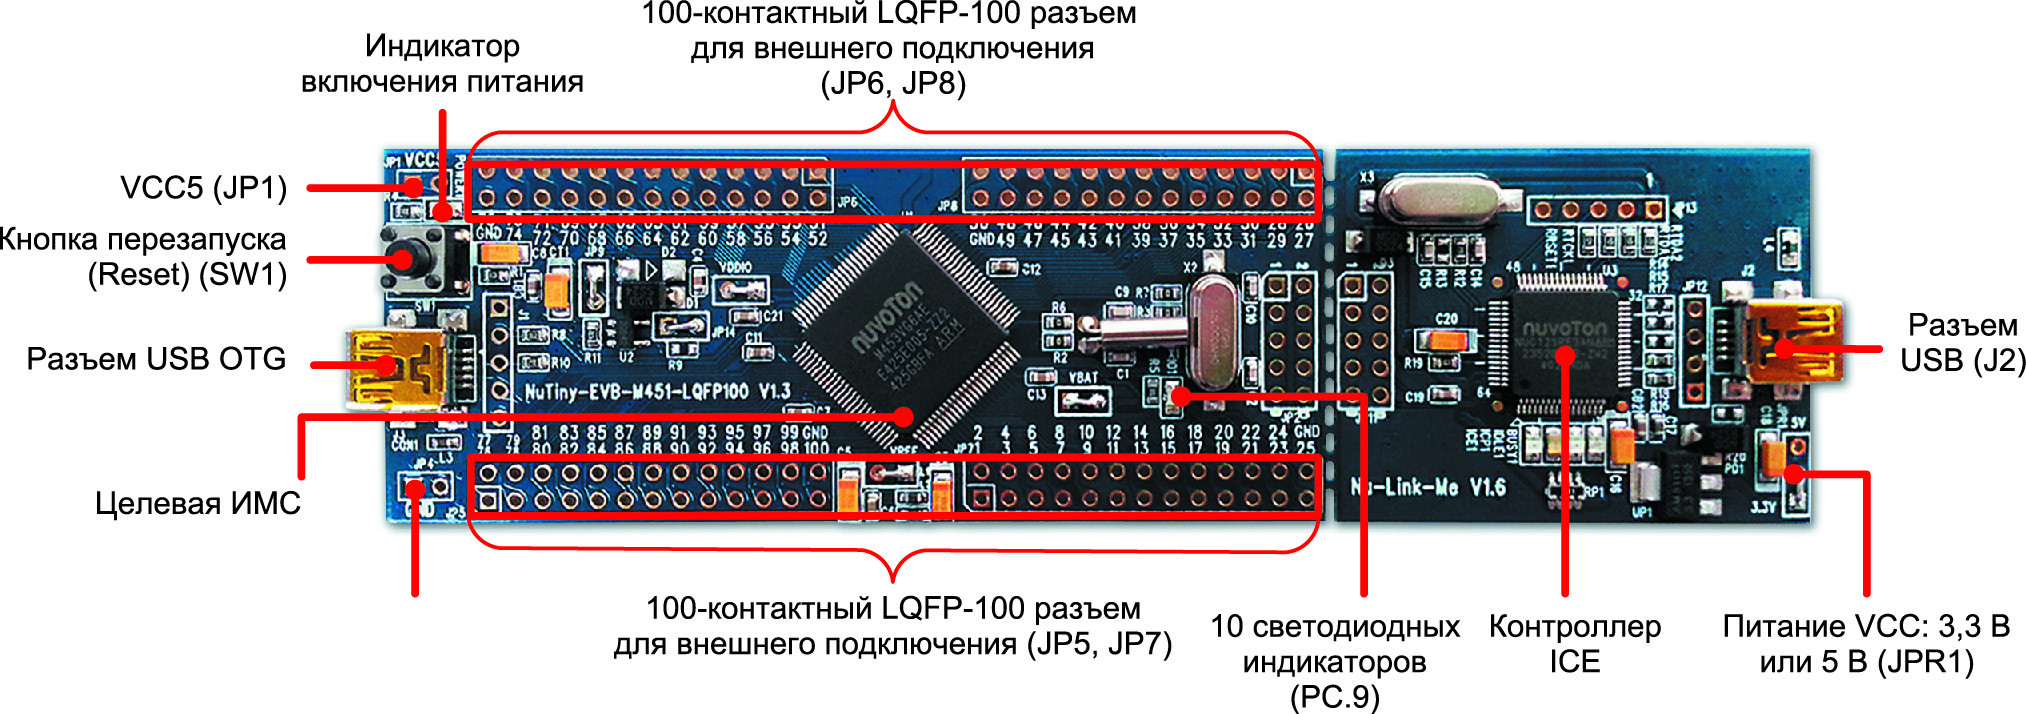 Отладочная плата NuTiny-SDK-M453 с микроконтроллером M453VG6AE